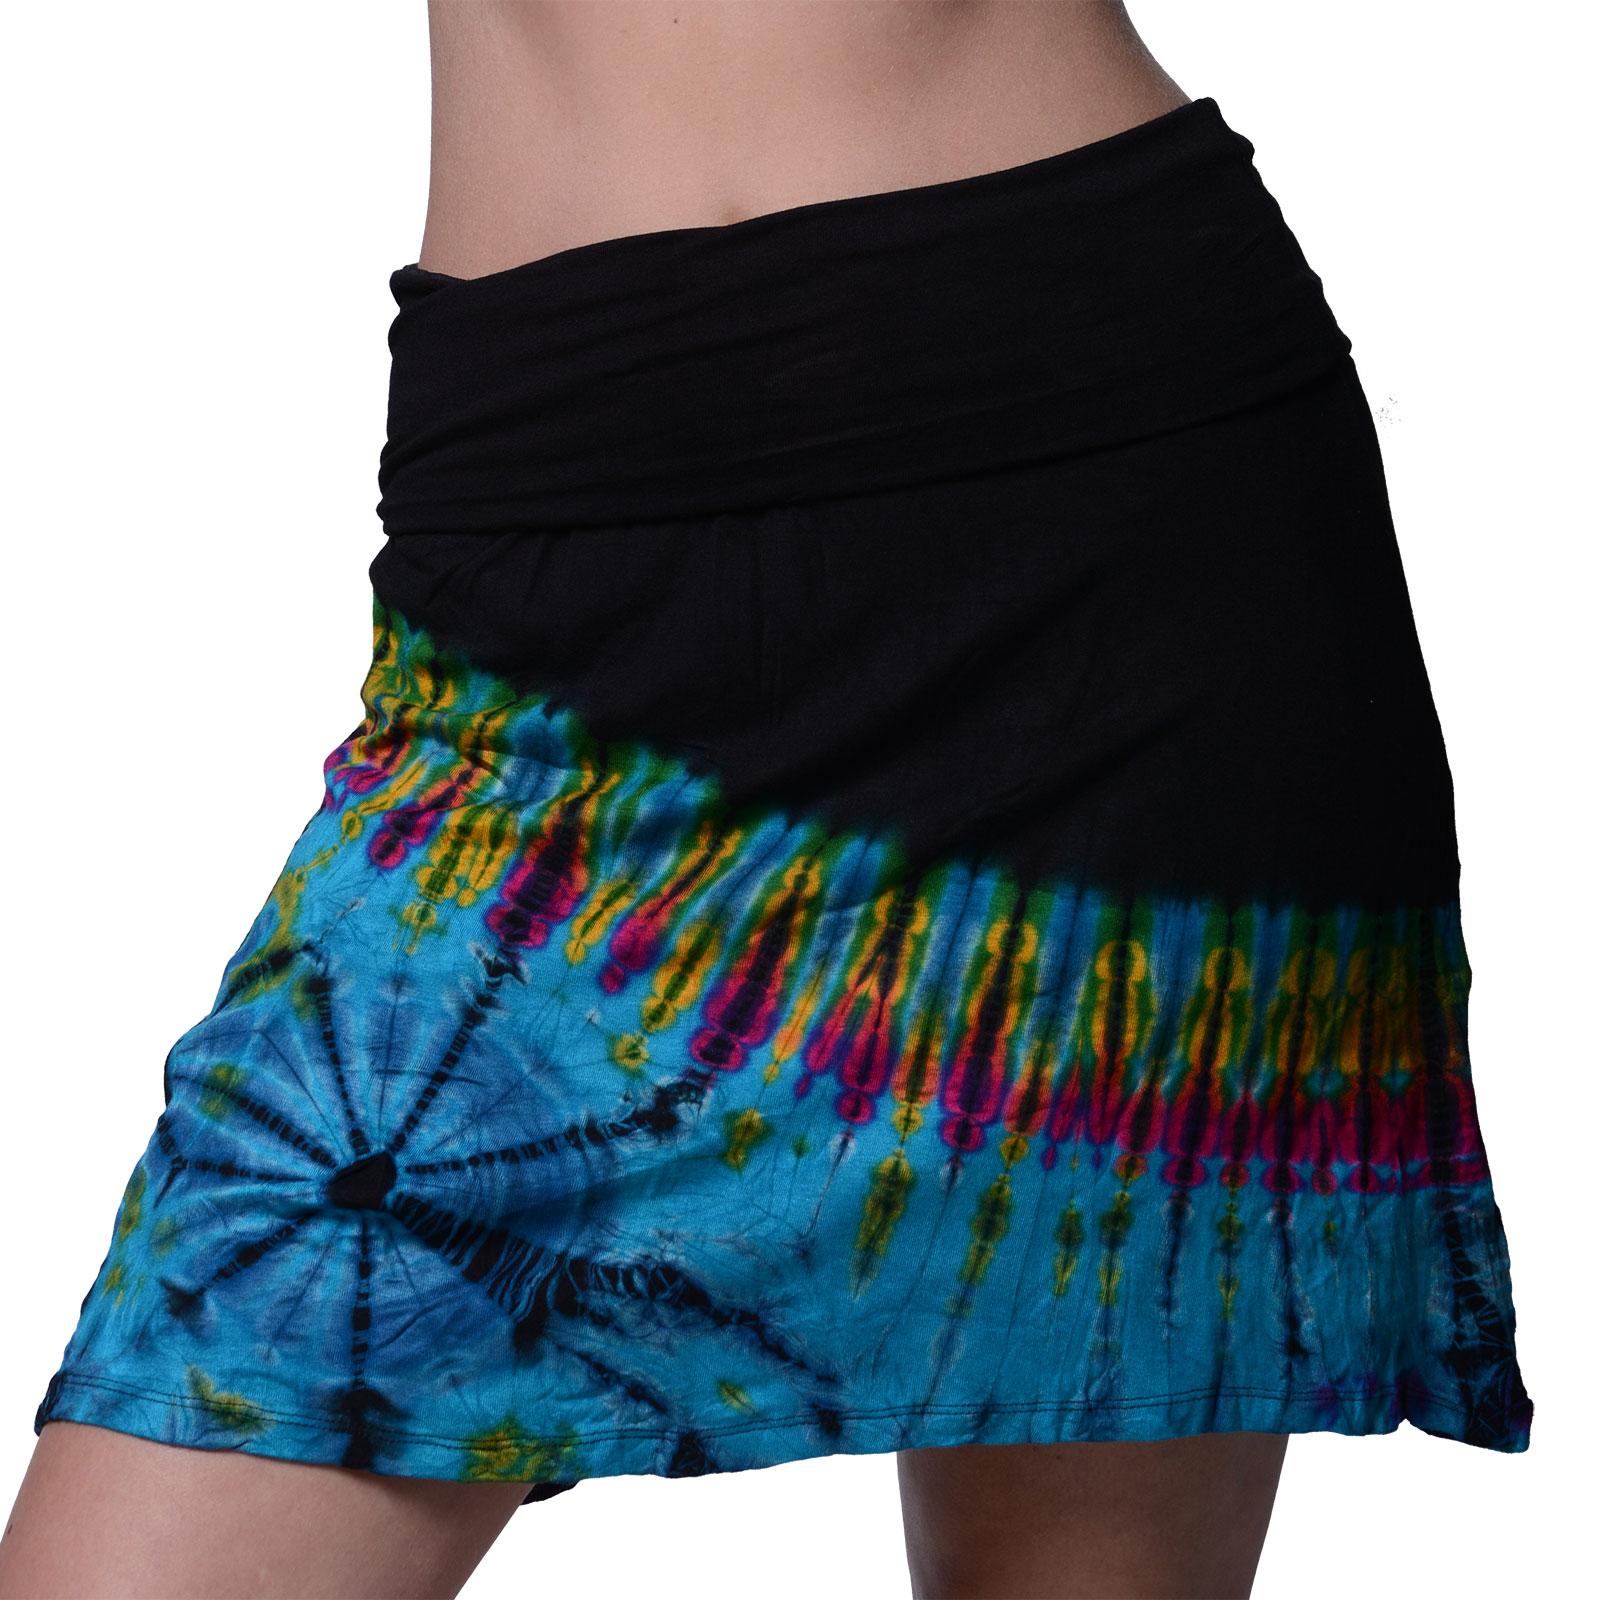 kunst und magie bunter damentie dye batik mini rock hippie goa. Black Bedroom Furniture Sets. Home Design Ideas